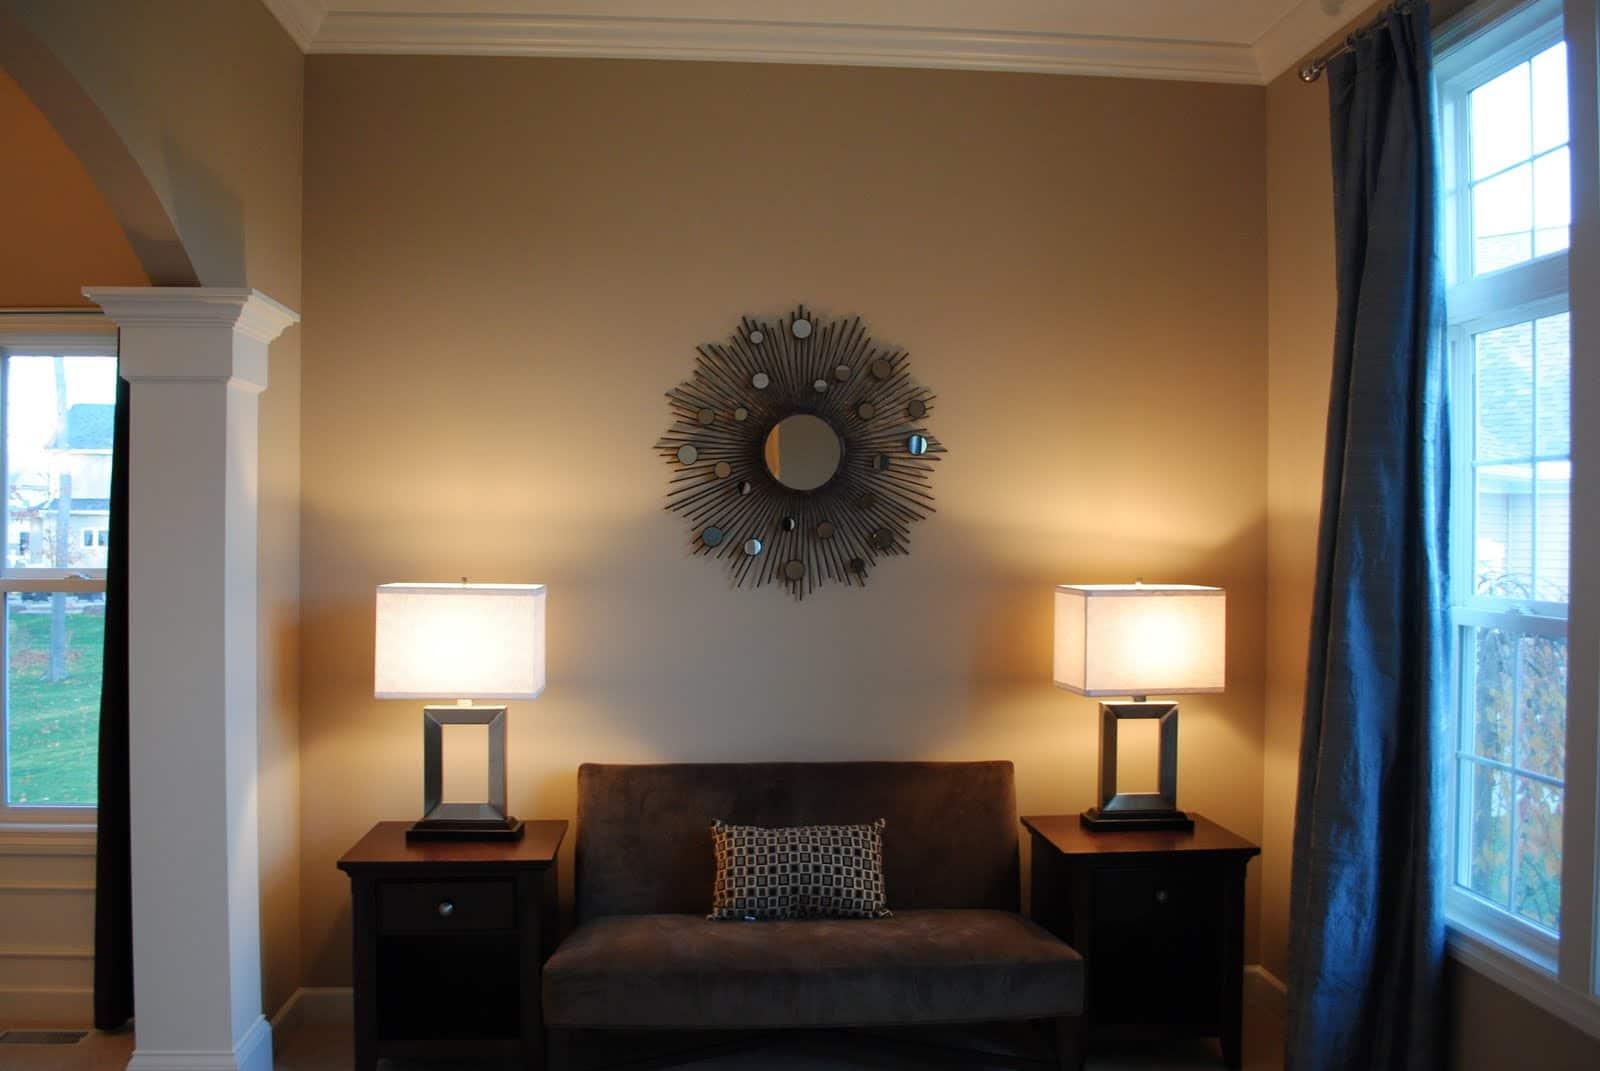 HD Image Mirror Wall Decor